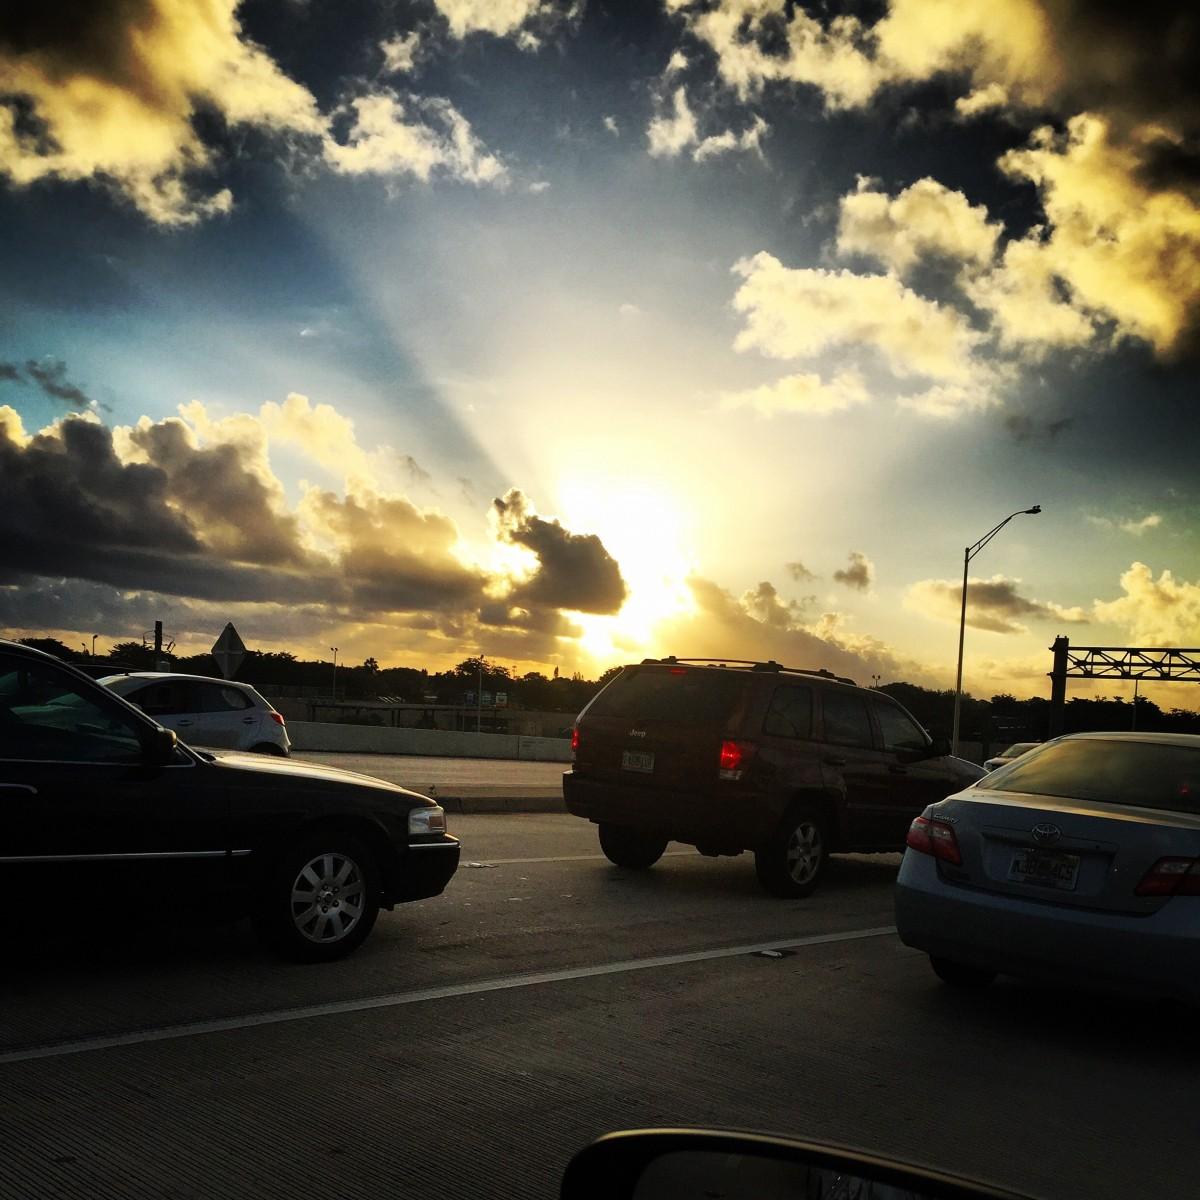 Free Images : Light, Cloud, Sky, Sunset, Car, Sunlight